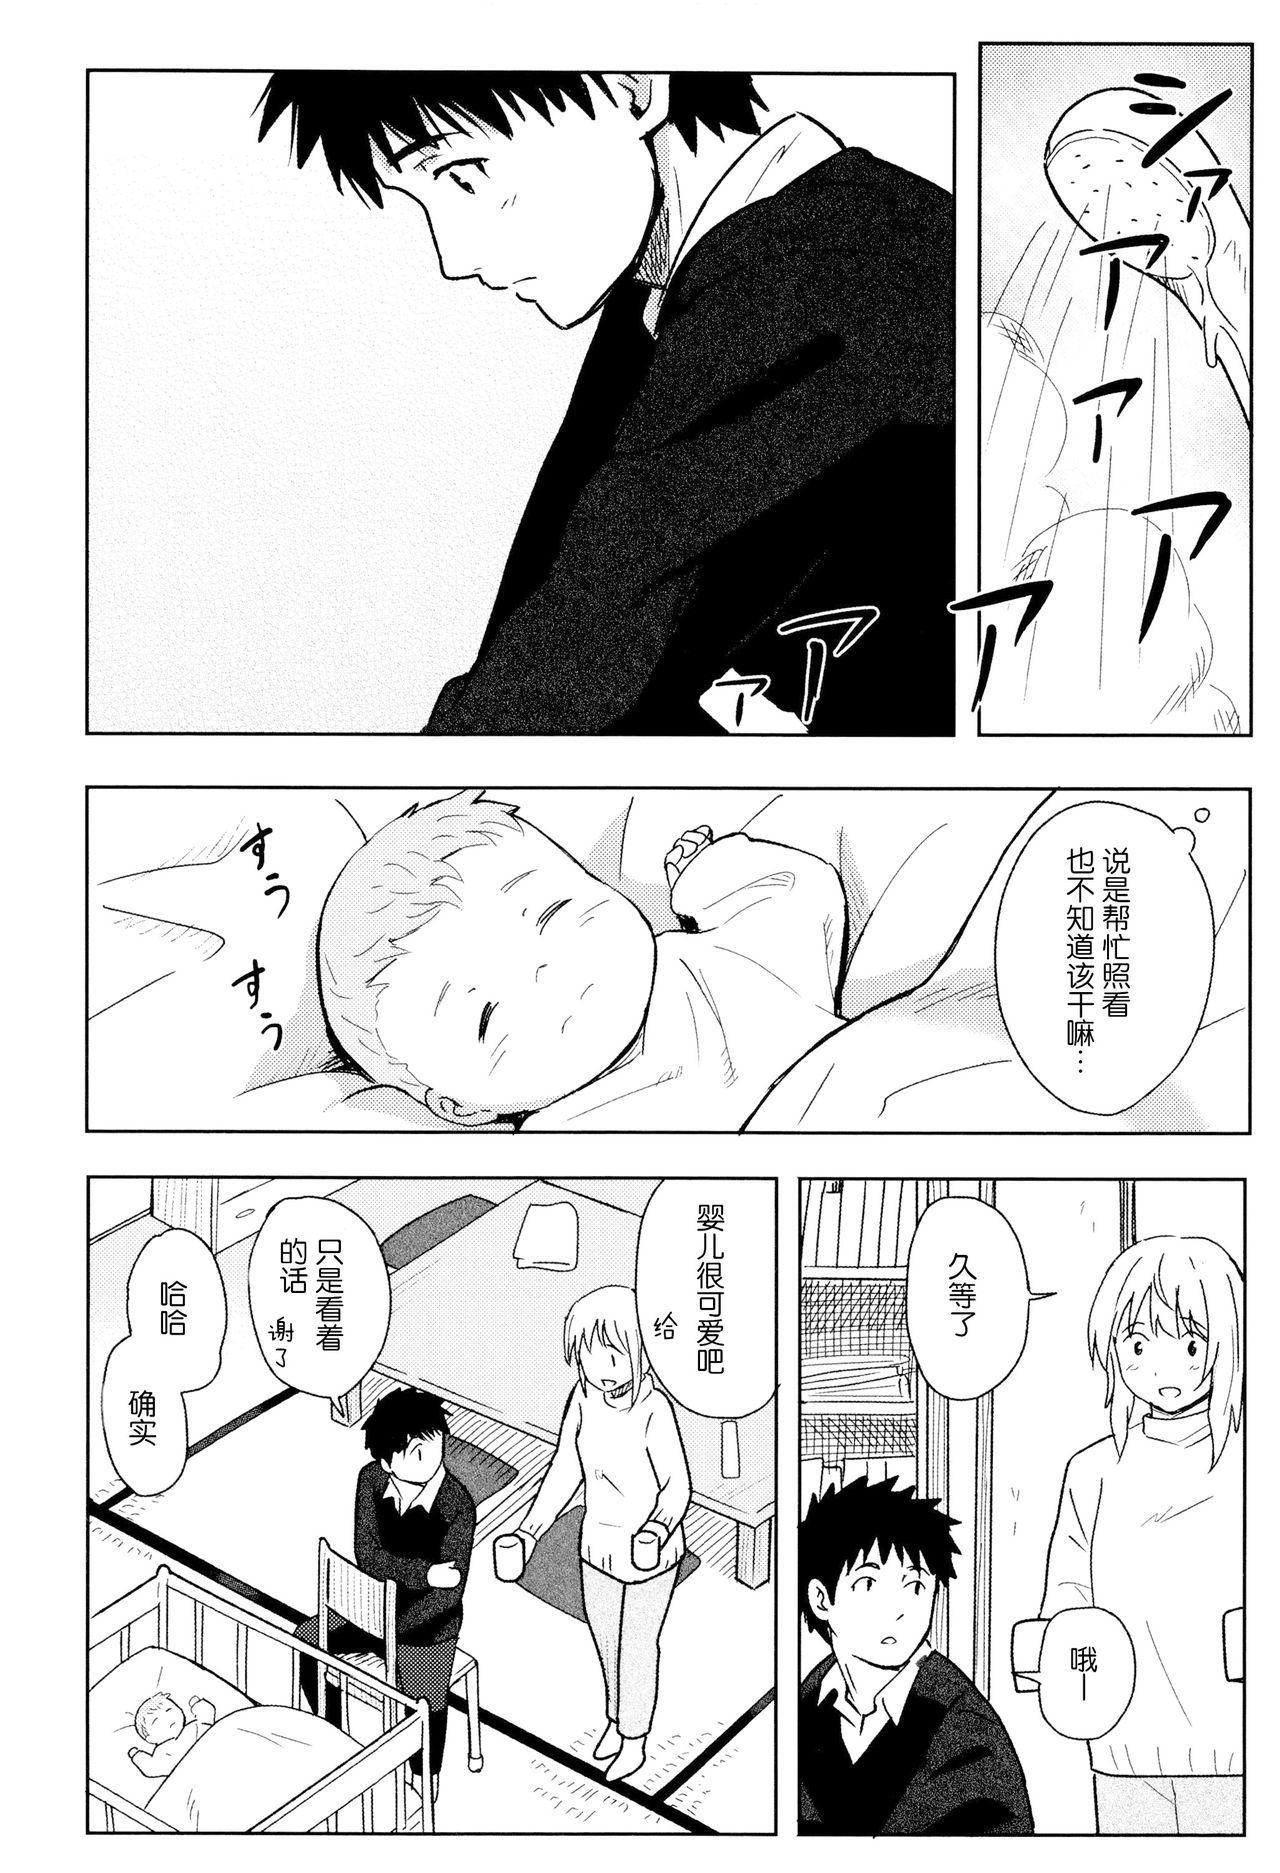 Tokubetsu na Mainichi - Special daily 38